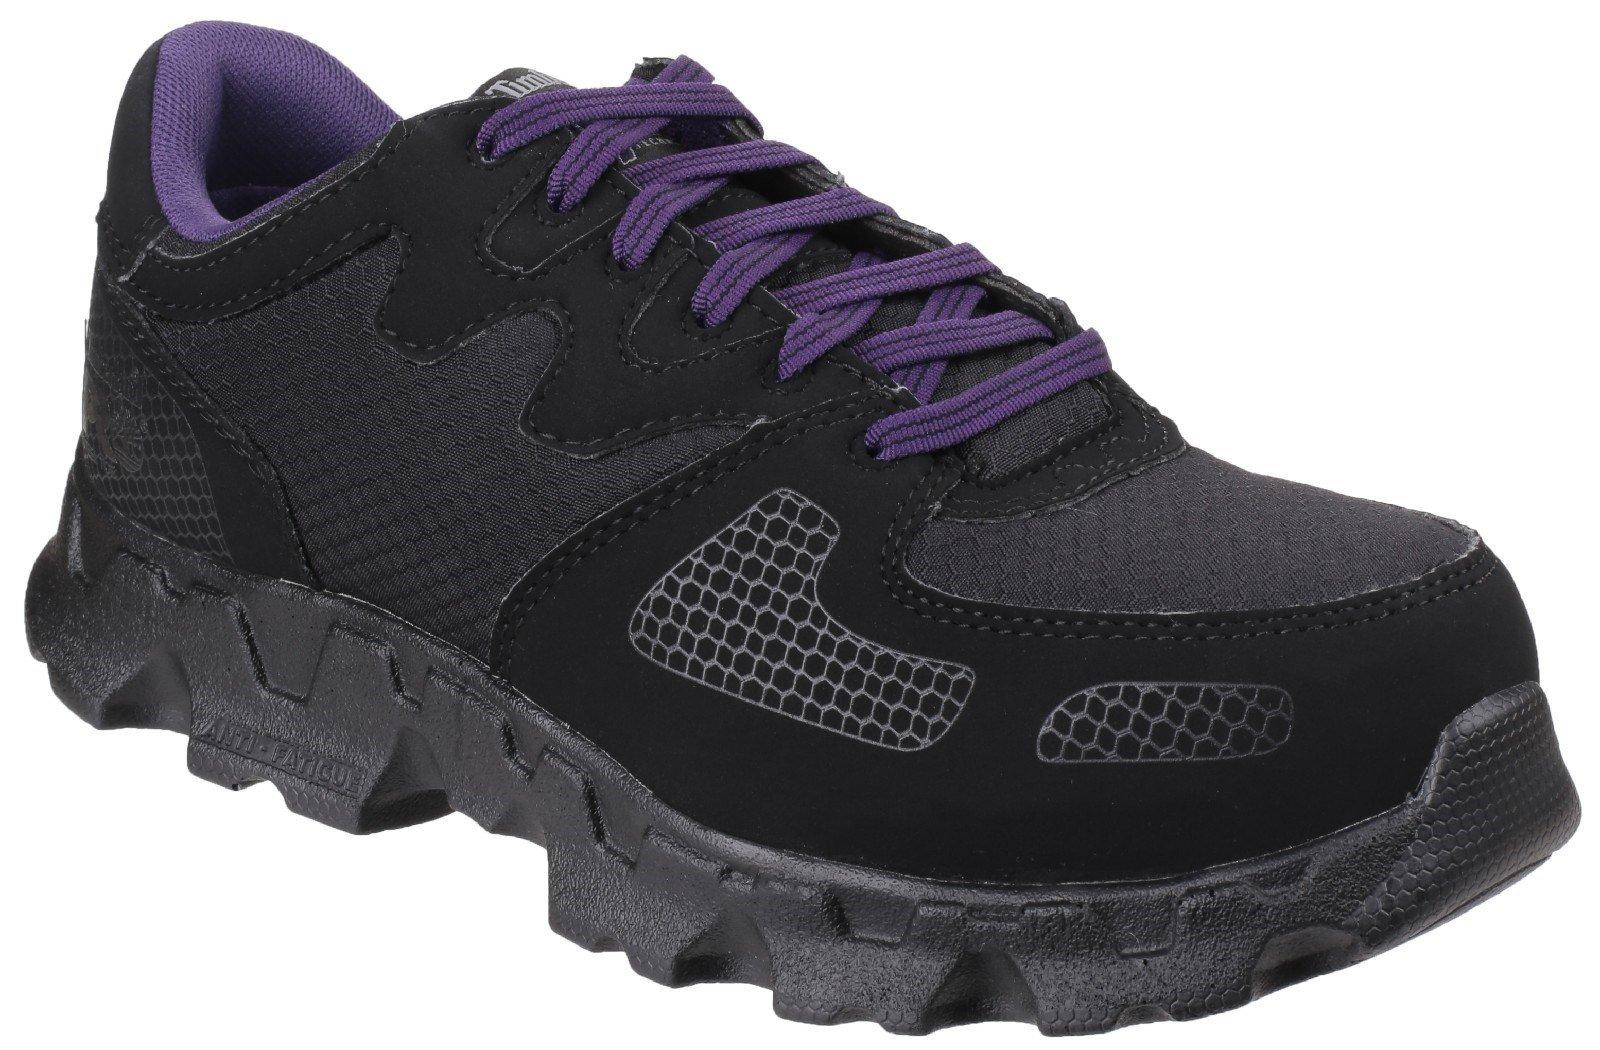 Timberland Pro Men's Powertrain Low Lace-up Trainer Black 24728 - Black 3